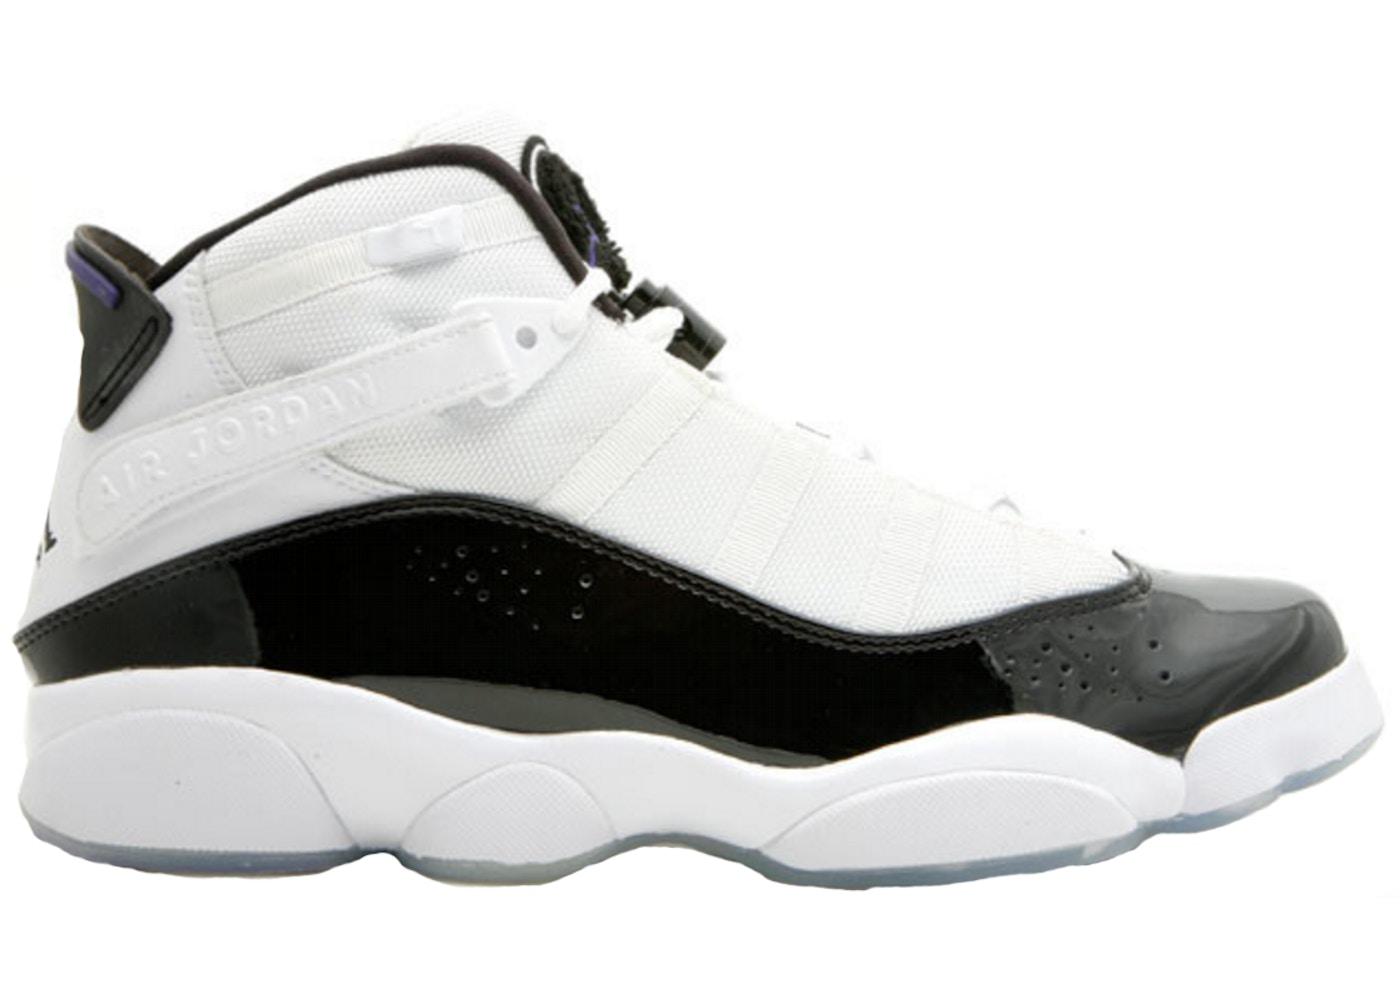 Factory Price New Mens Nike Air Jordan 6 Rings White Black Concord 322992151 Size 8 2008